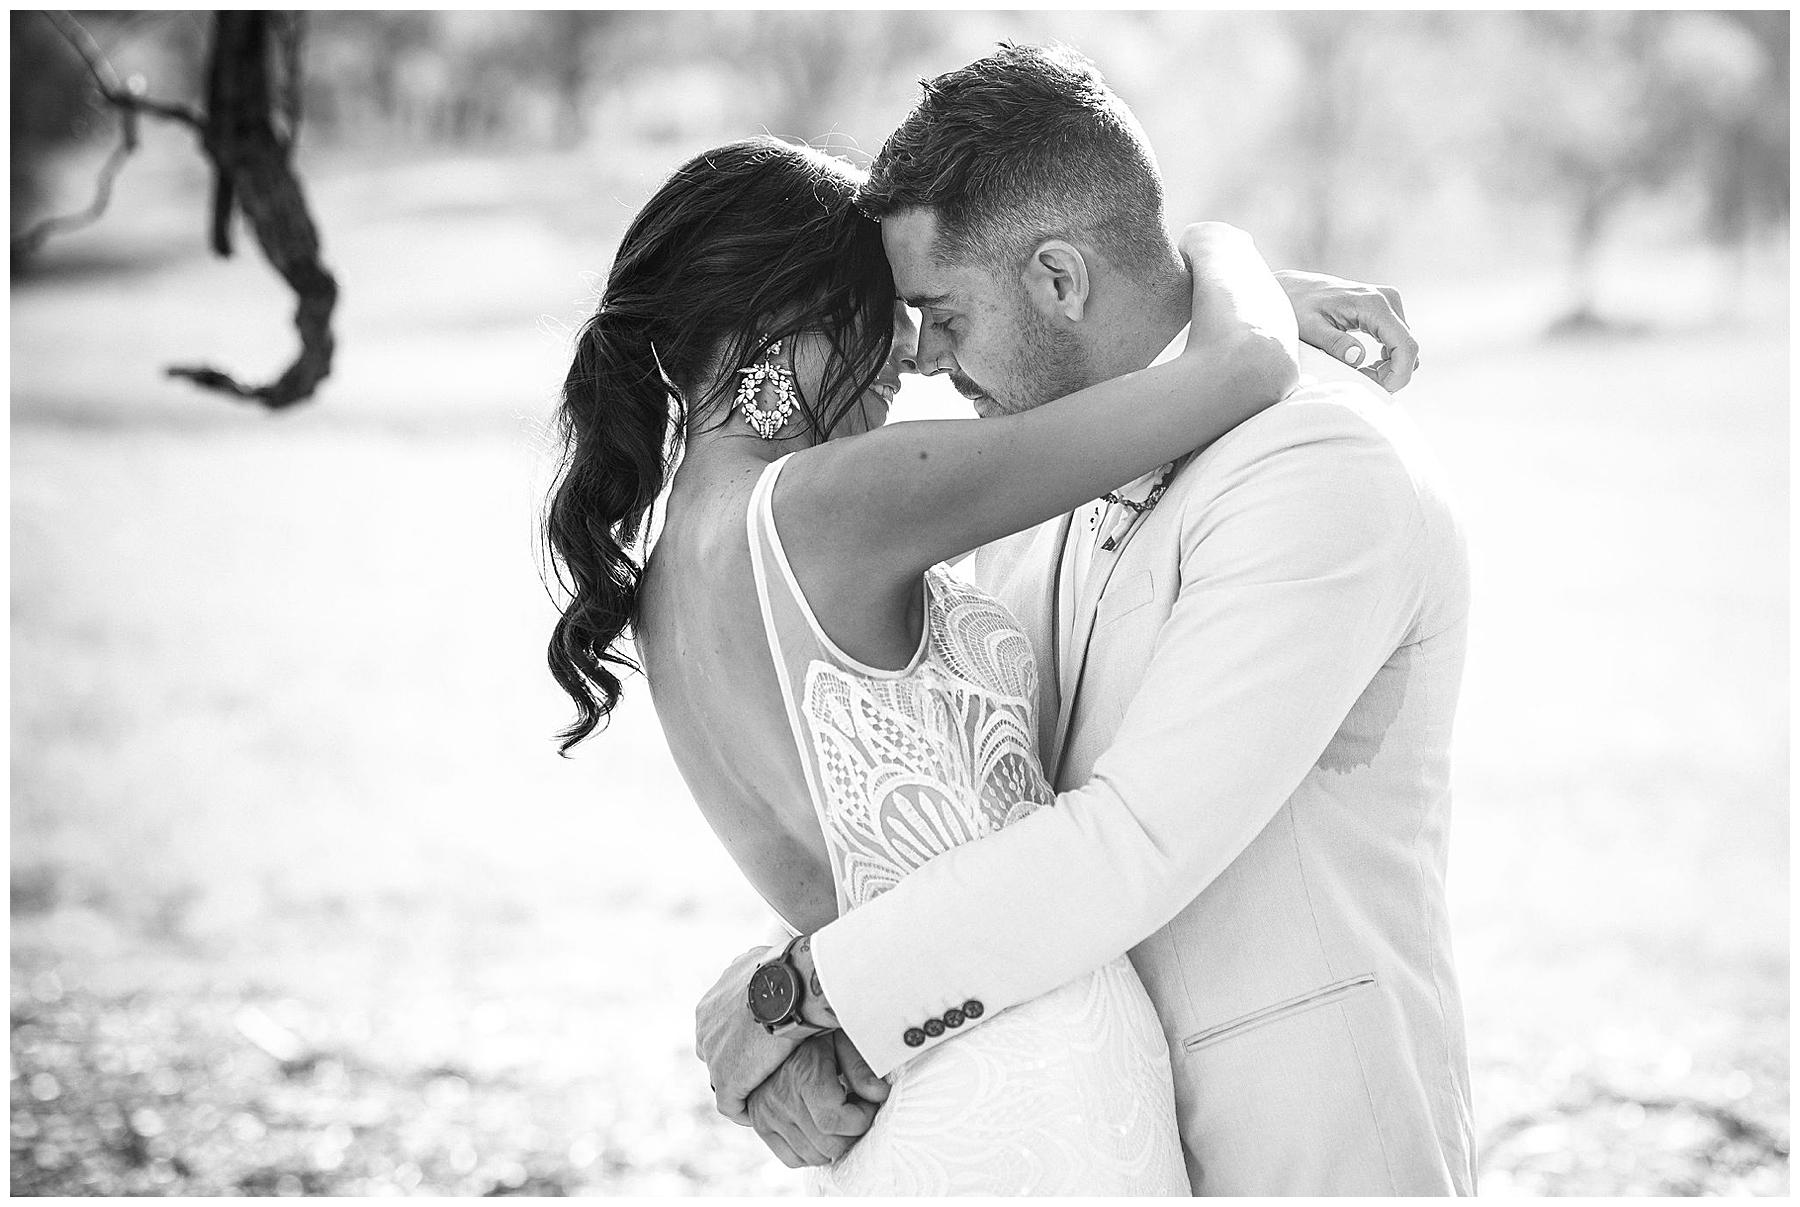 Adam's Peak Wedding Photos + Popcorn Photography_0056.jpg